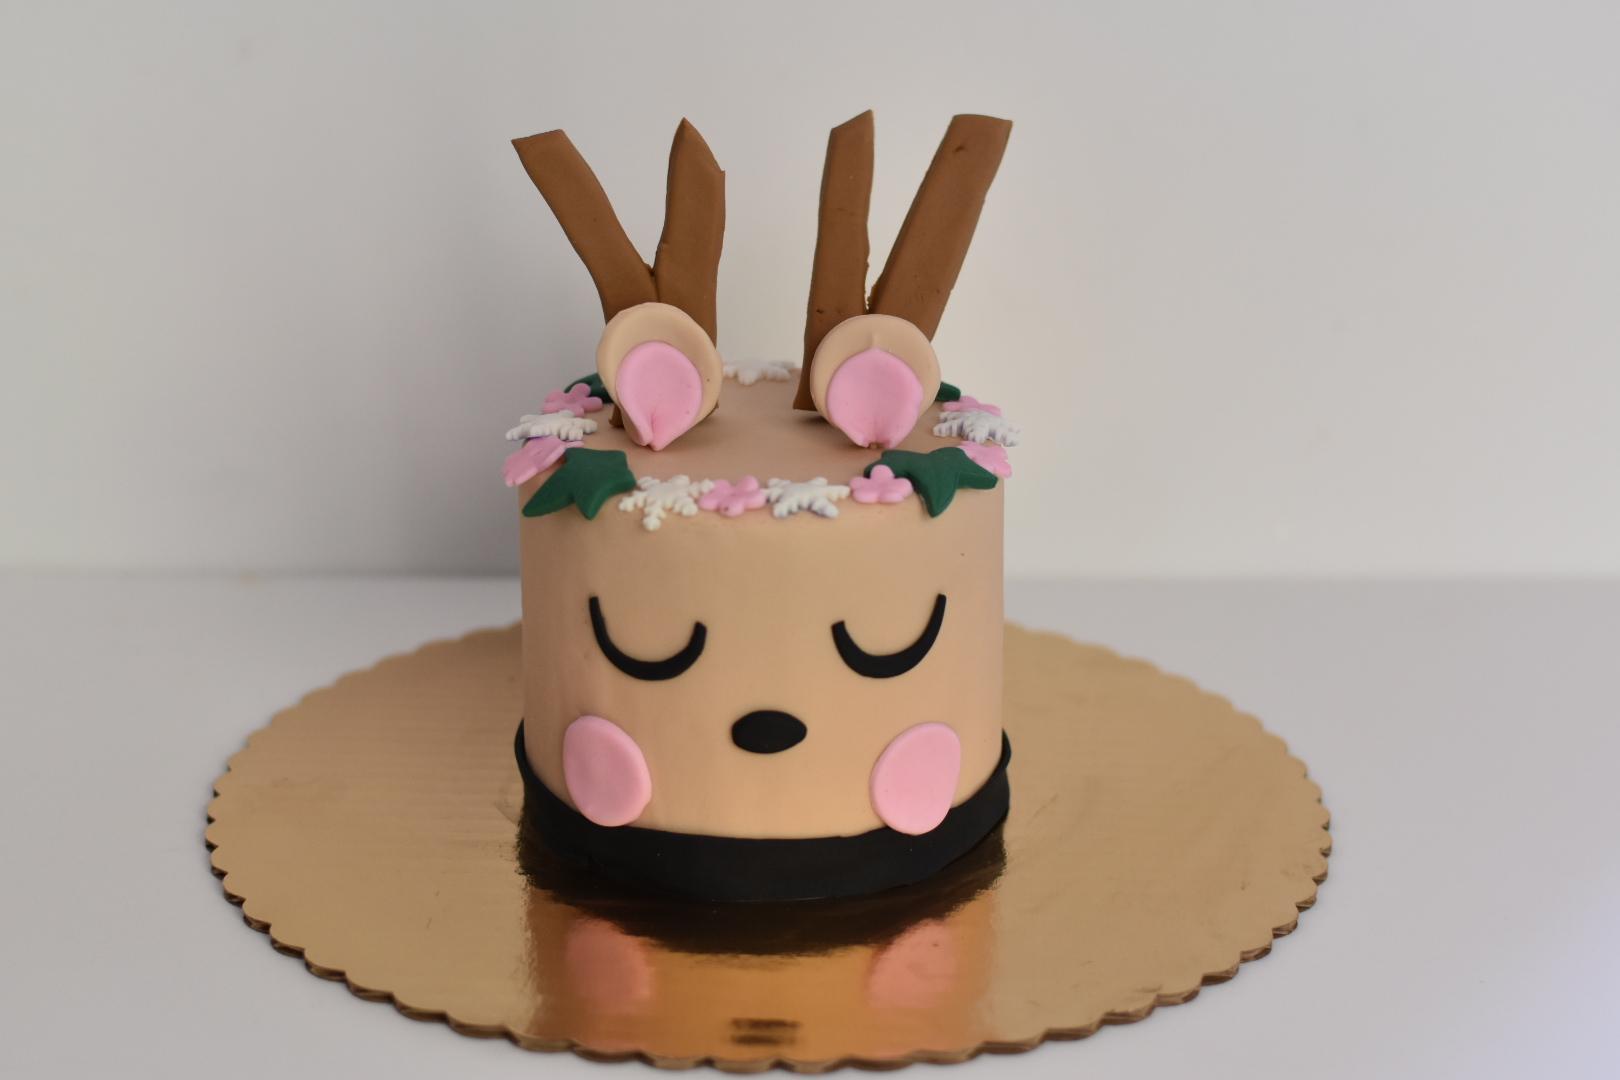 Reindeer Fondant Cake Decorating - ACE